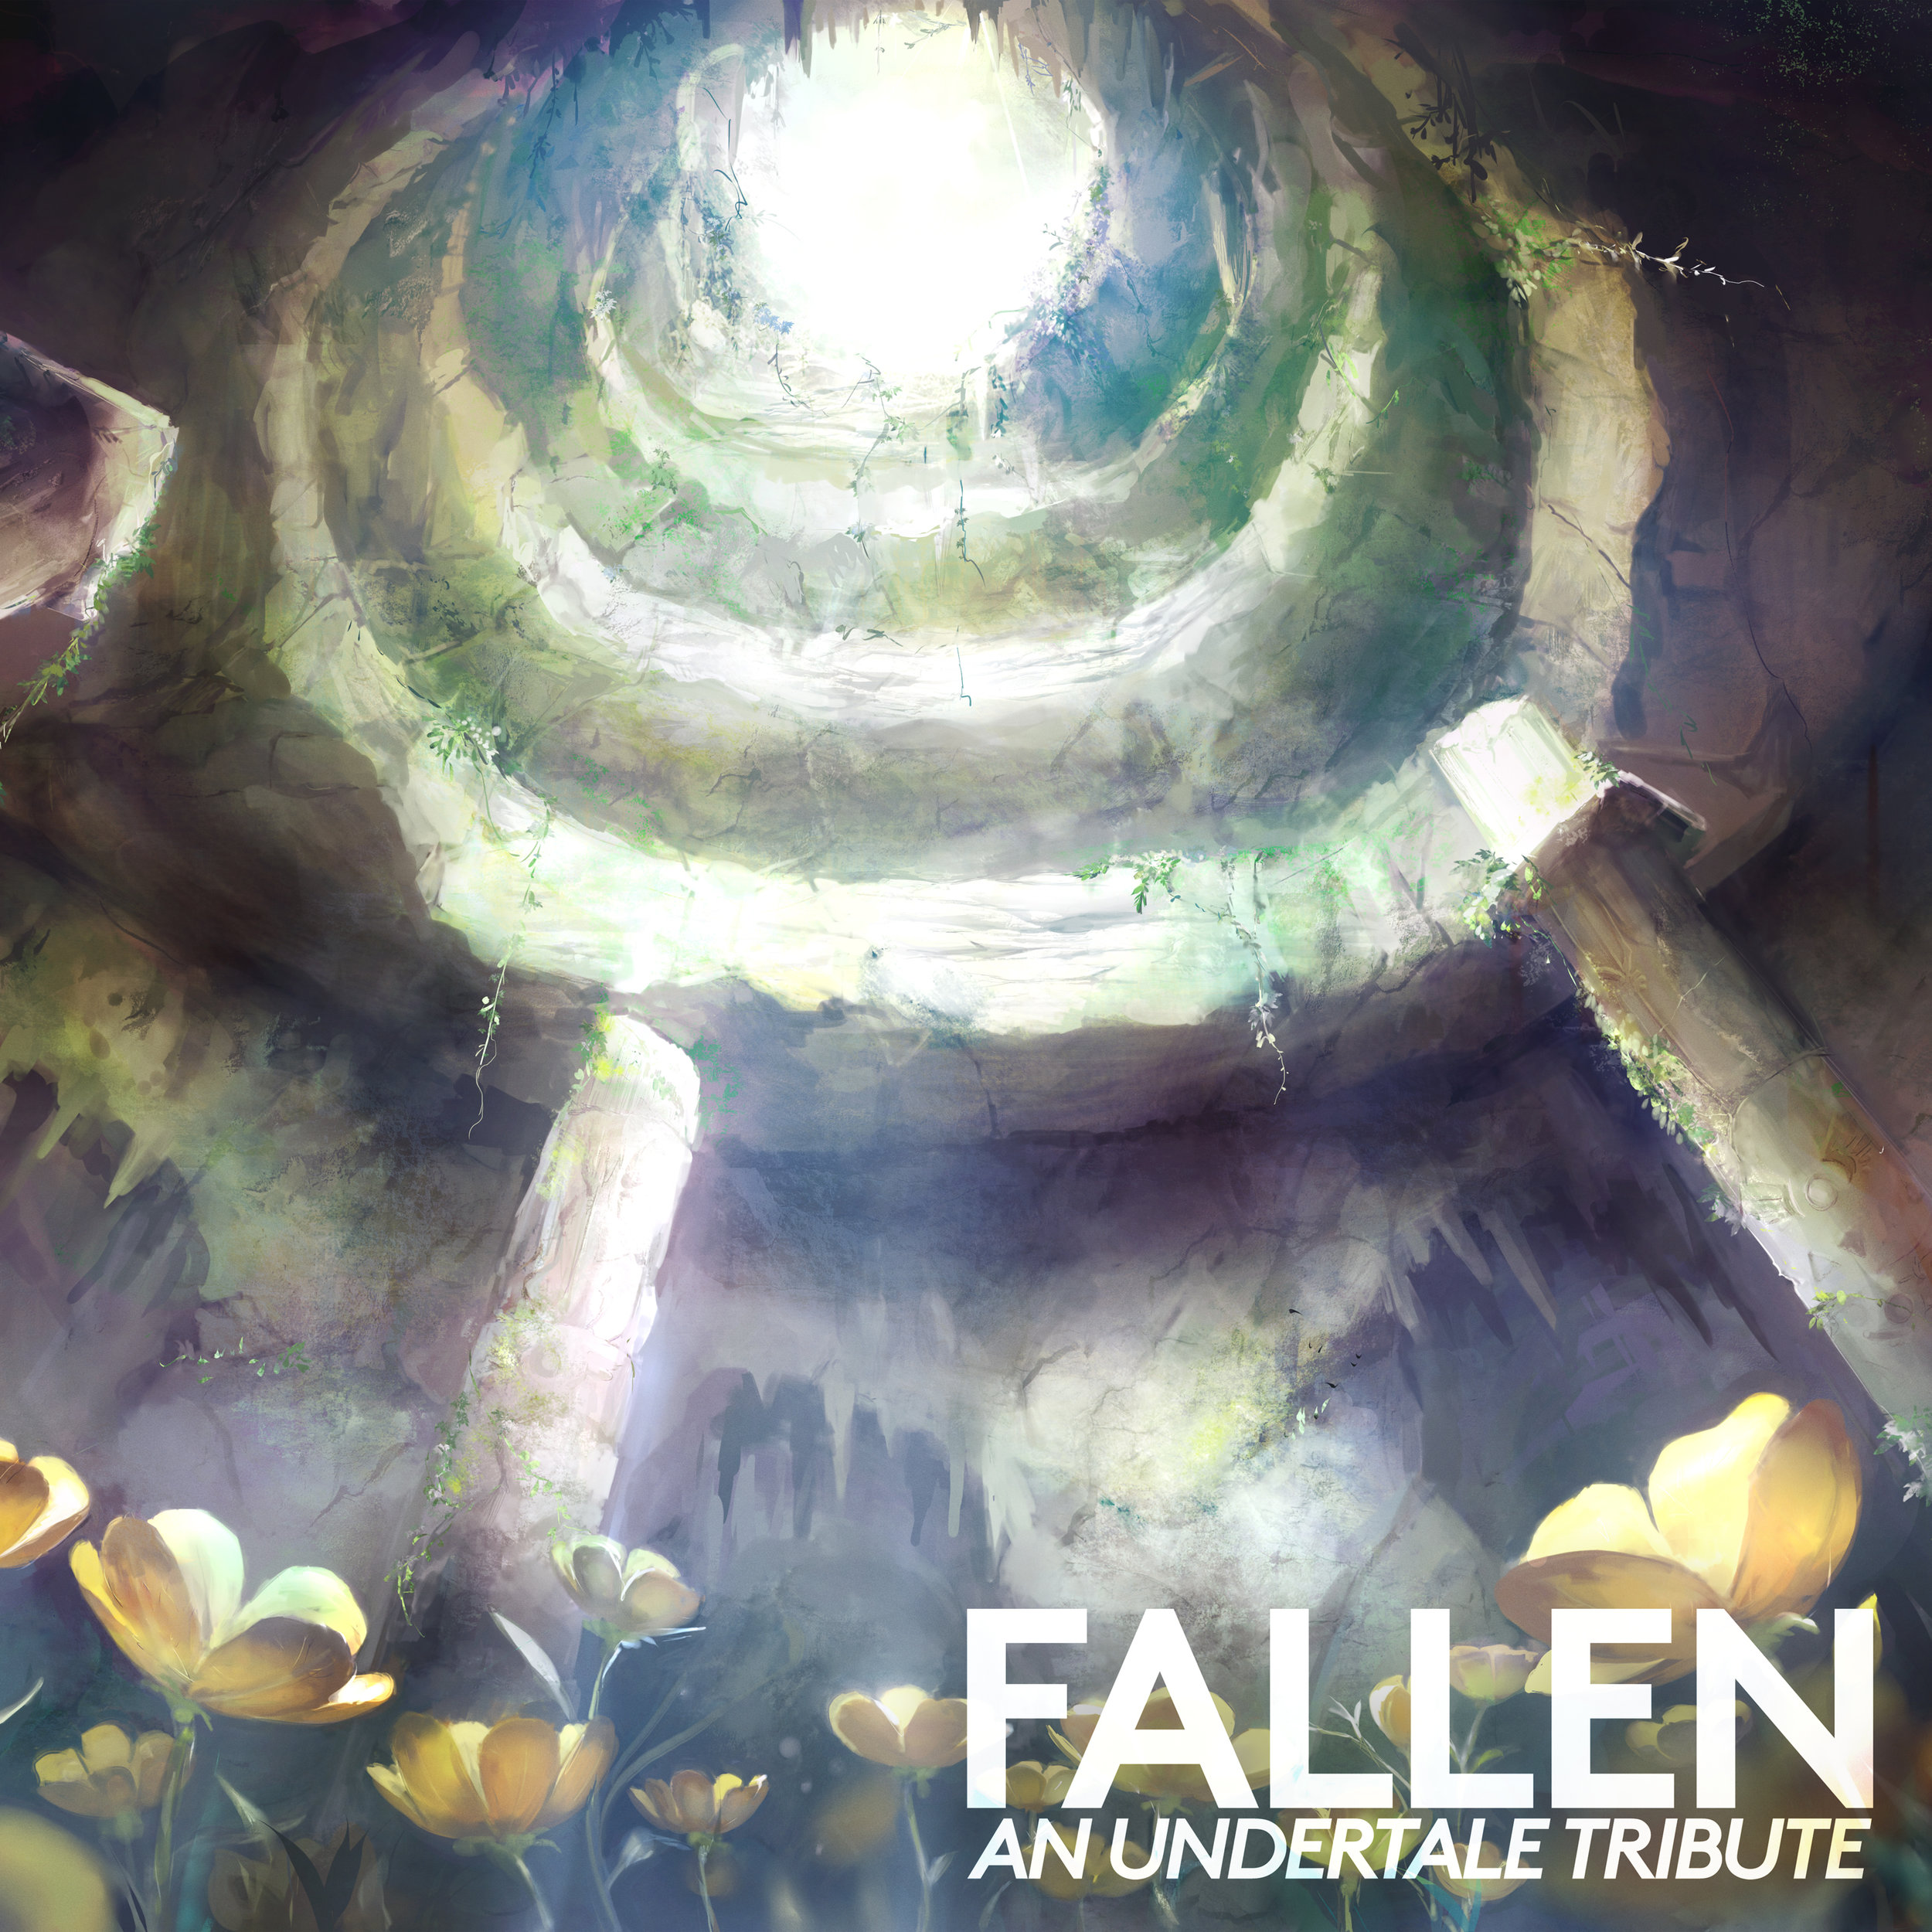 FALLEN: An Undertale Tribut   e     8. Another Medium / Core    (Toby Fox - arr.    David Peacock   )